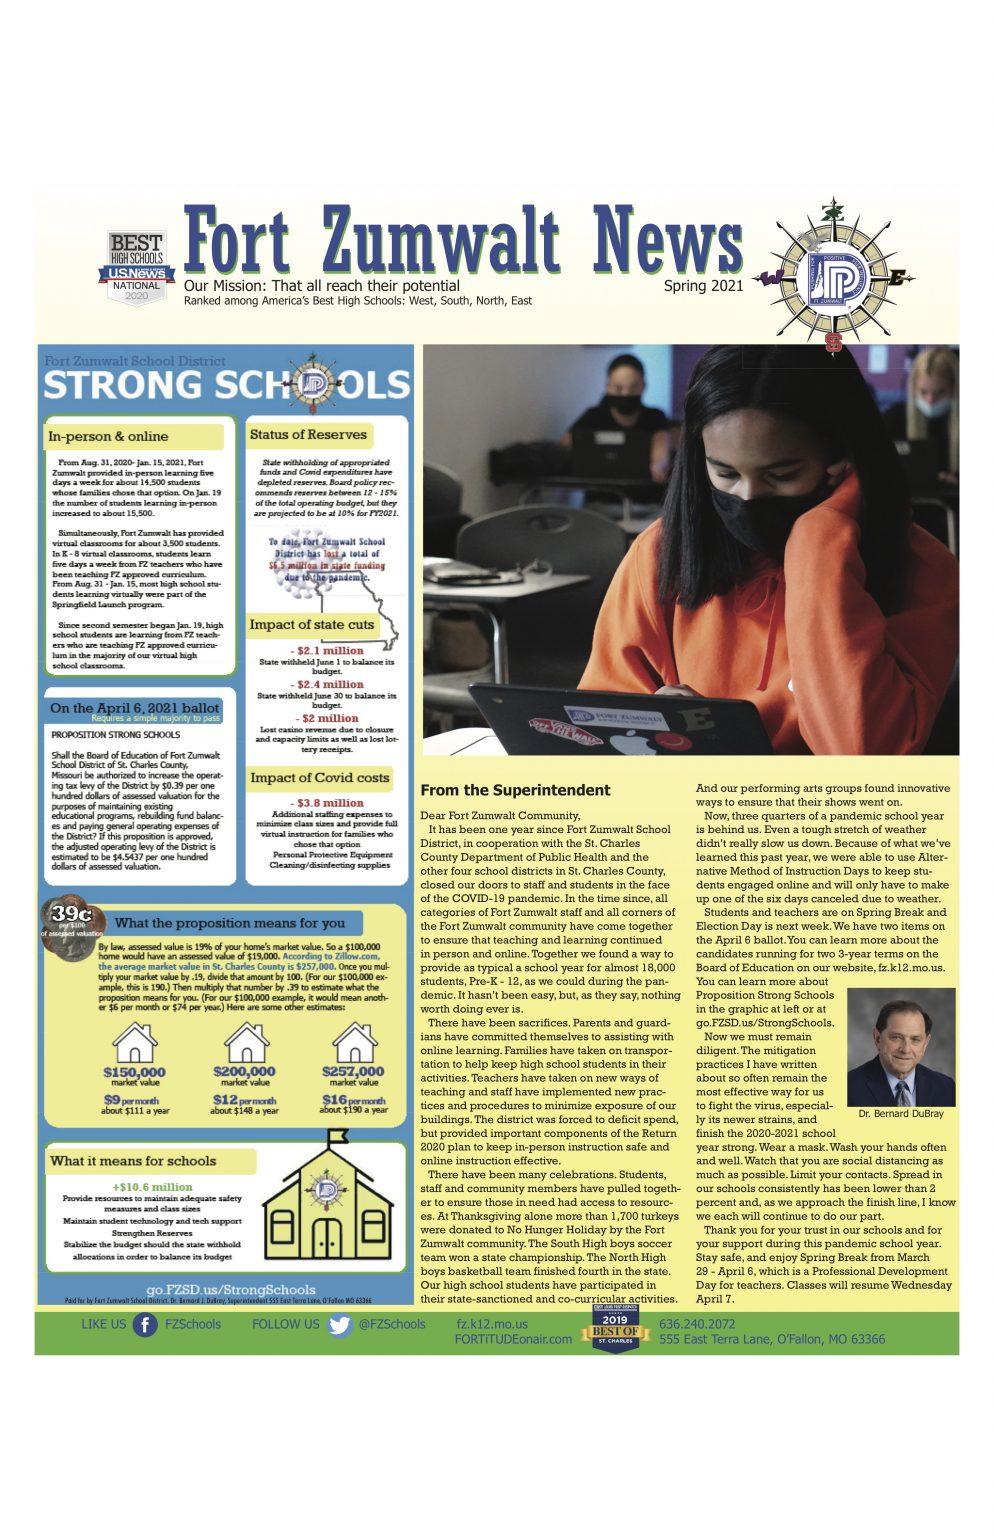 Fort Zumwalt News – Strong Schools – Community News With Fort Zumwalt Spring Break 2021